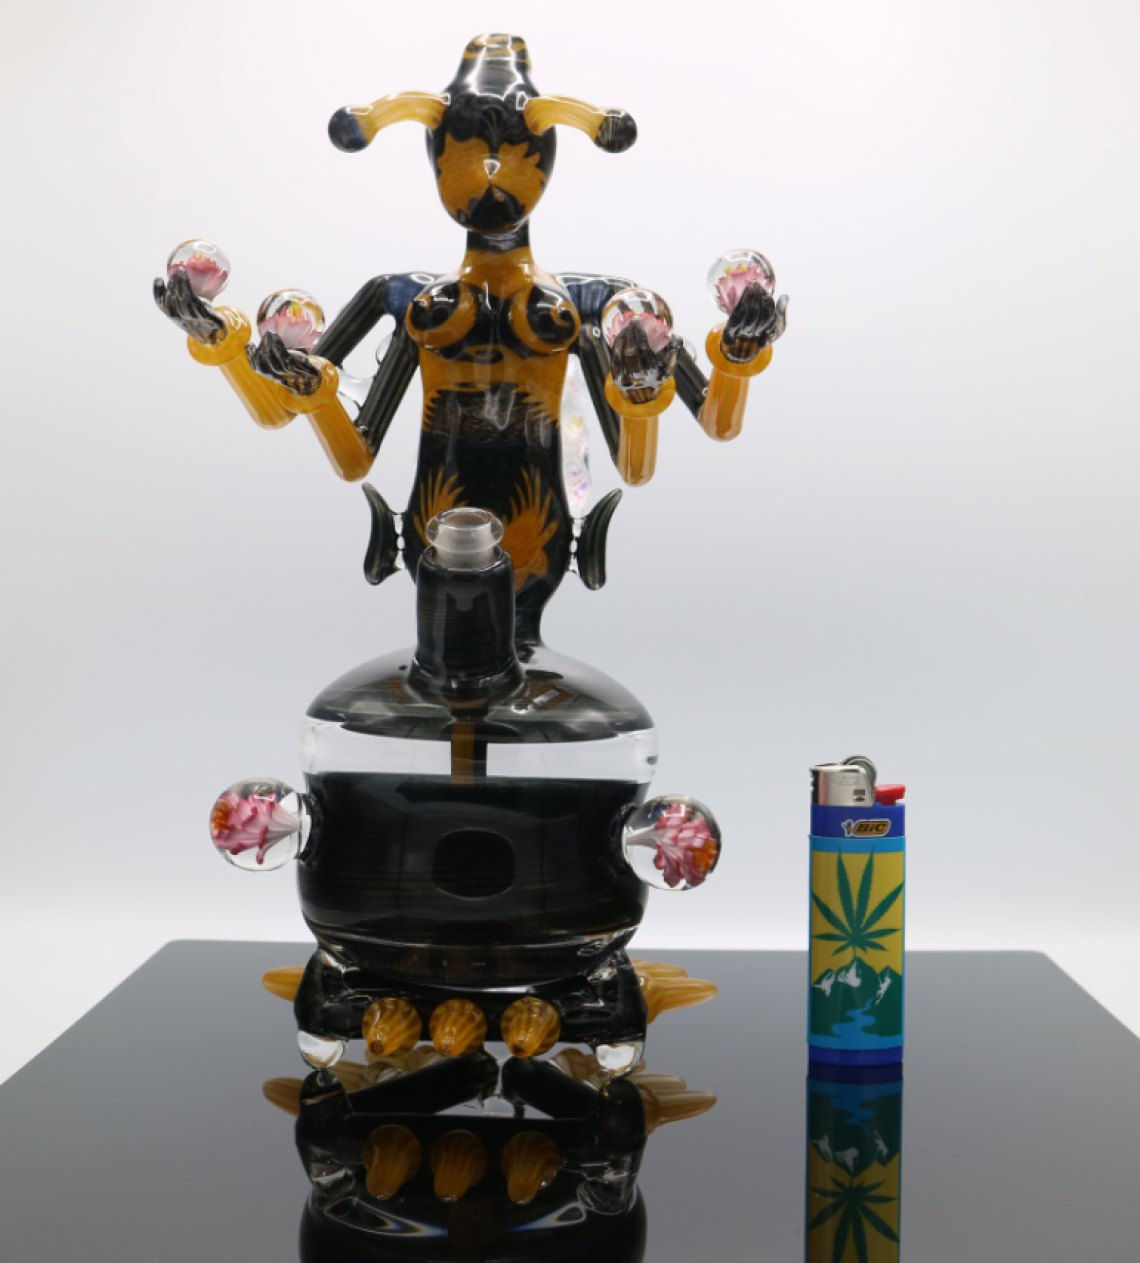 Kiebler – Wig Wag Fire Bee Creature Set